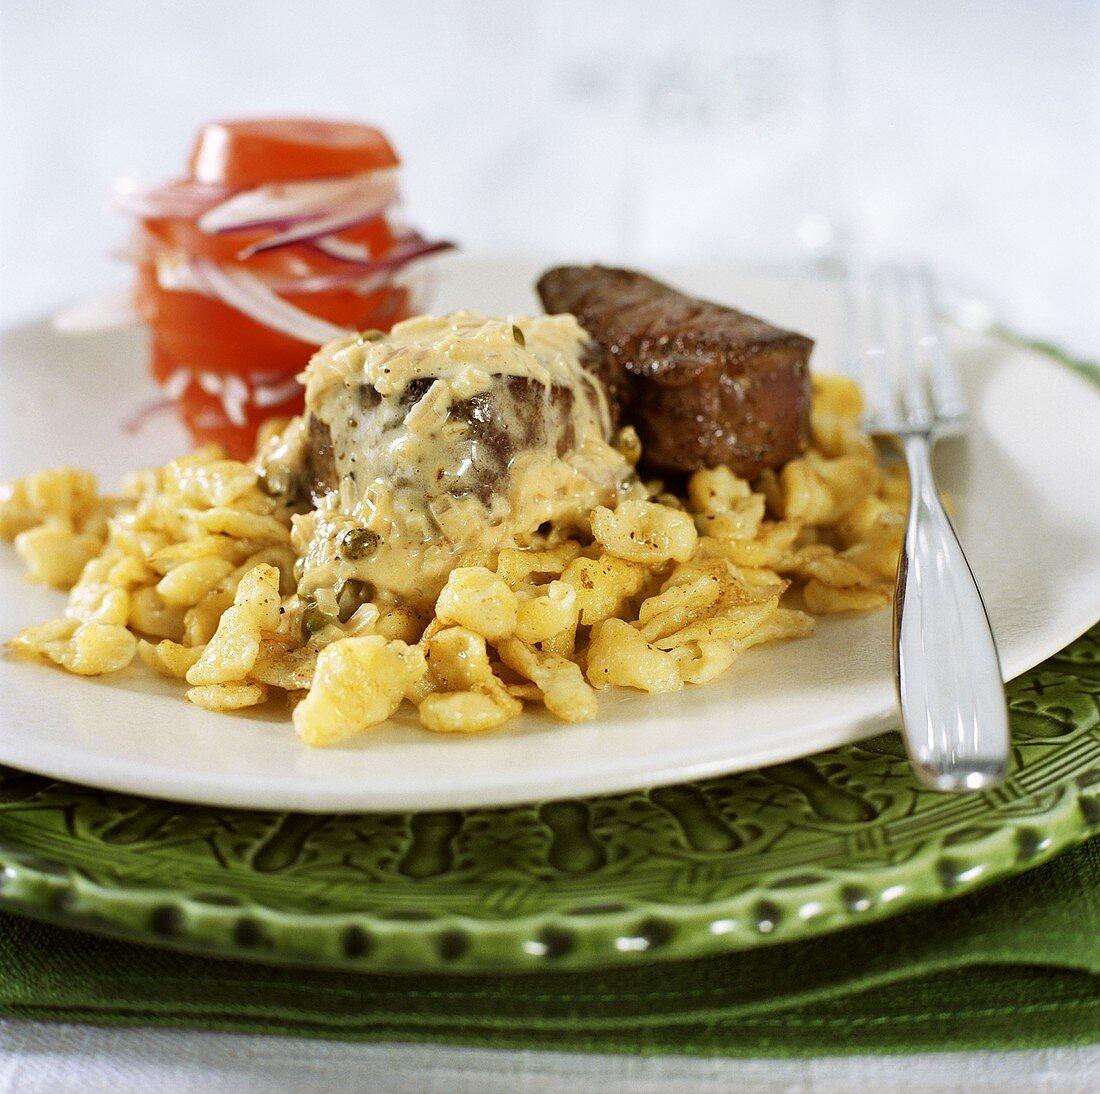 Fillet steak with home-made noodles (Spaetzle)